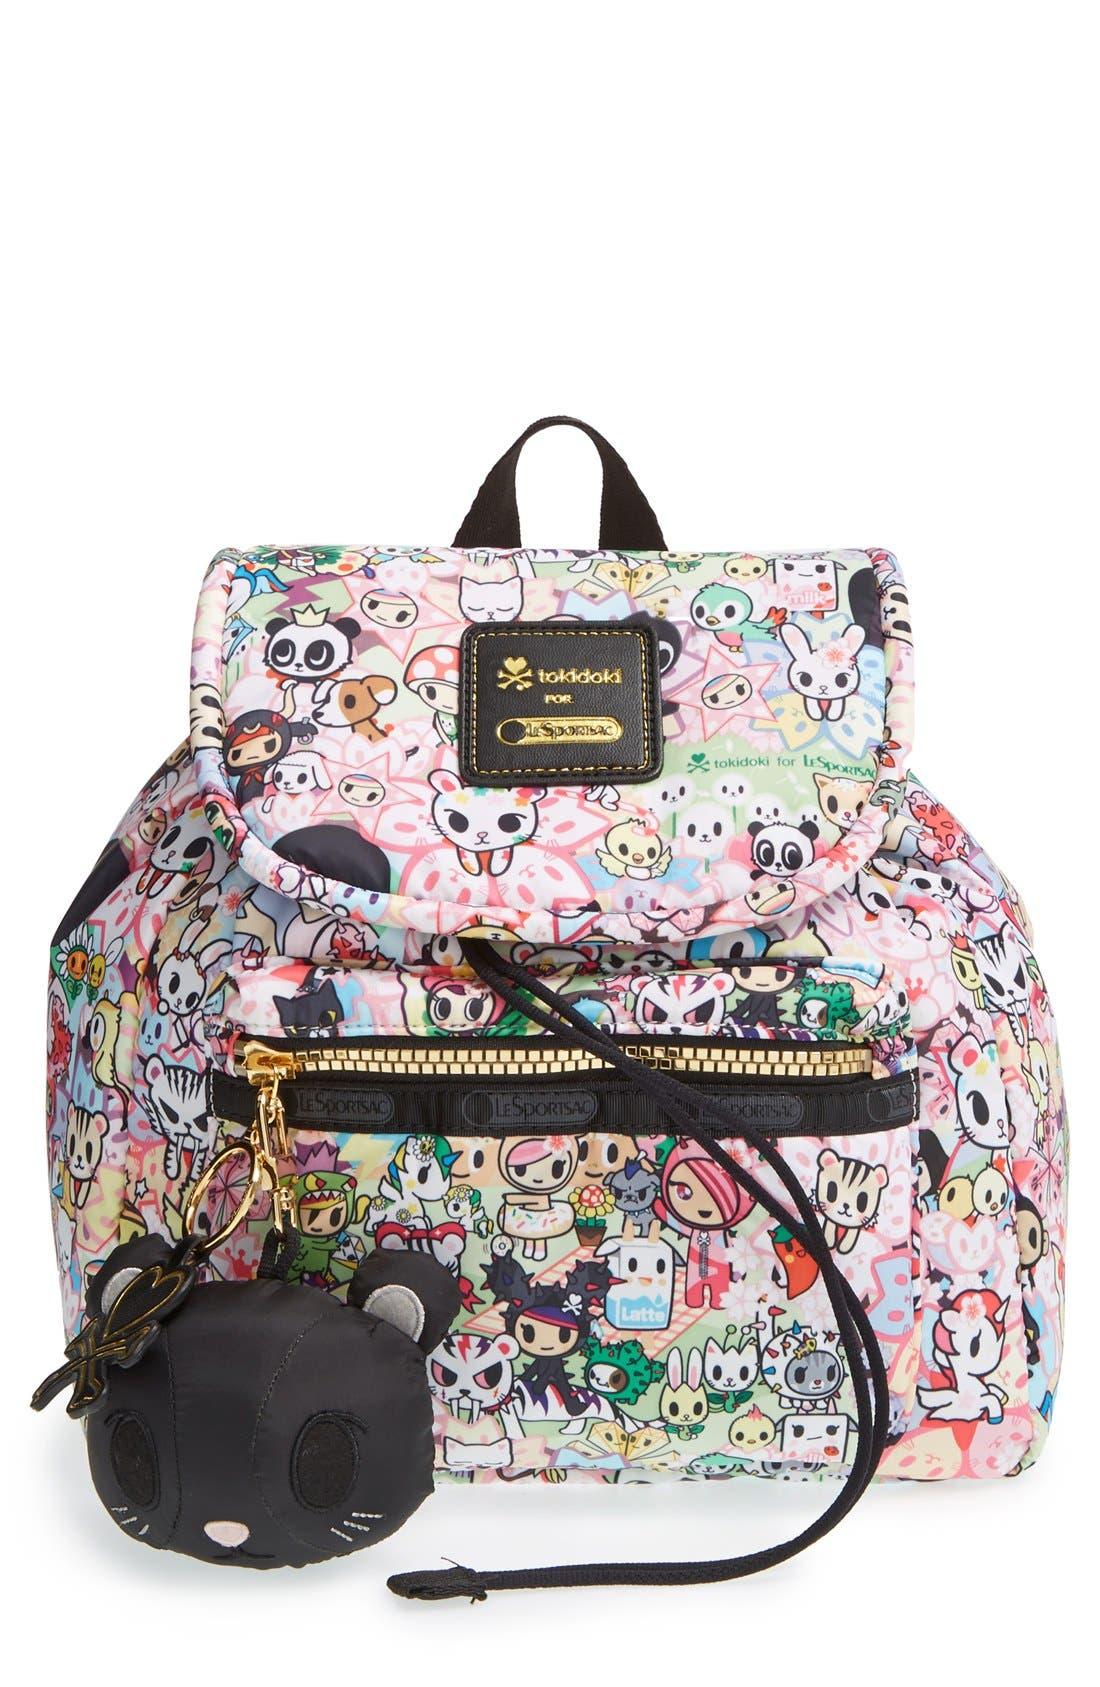 Main Image - tokidoki x LeSportsac 'Piccolina' Nylon Backpack